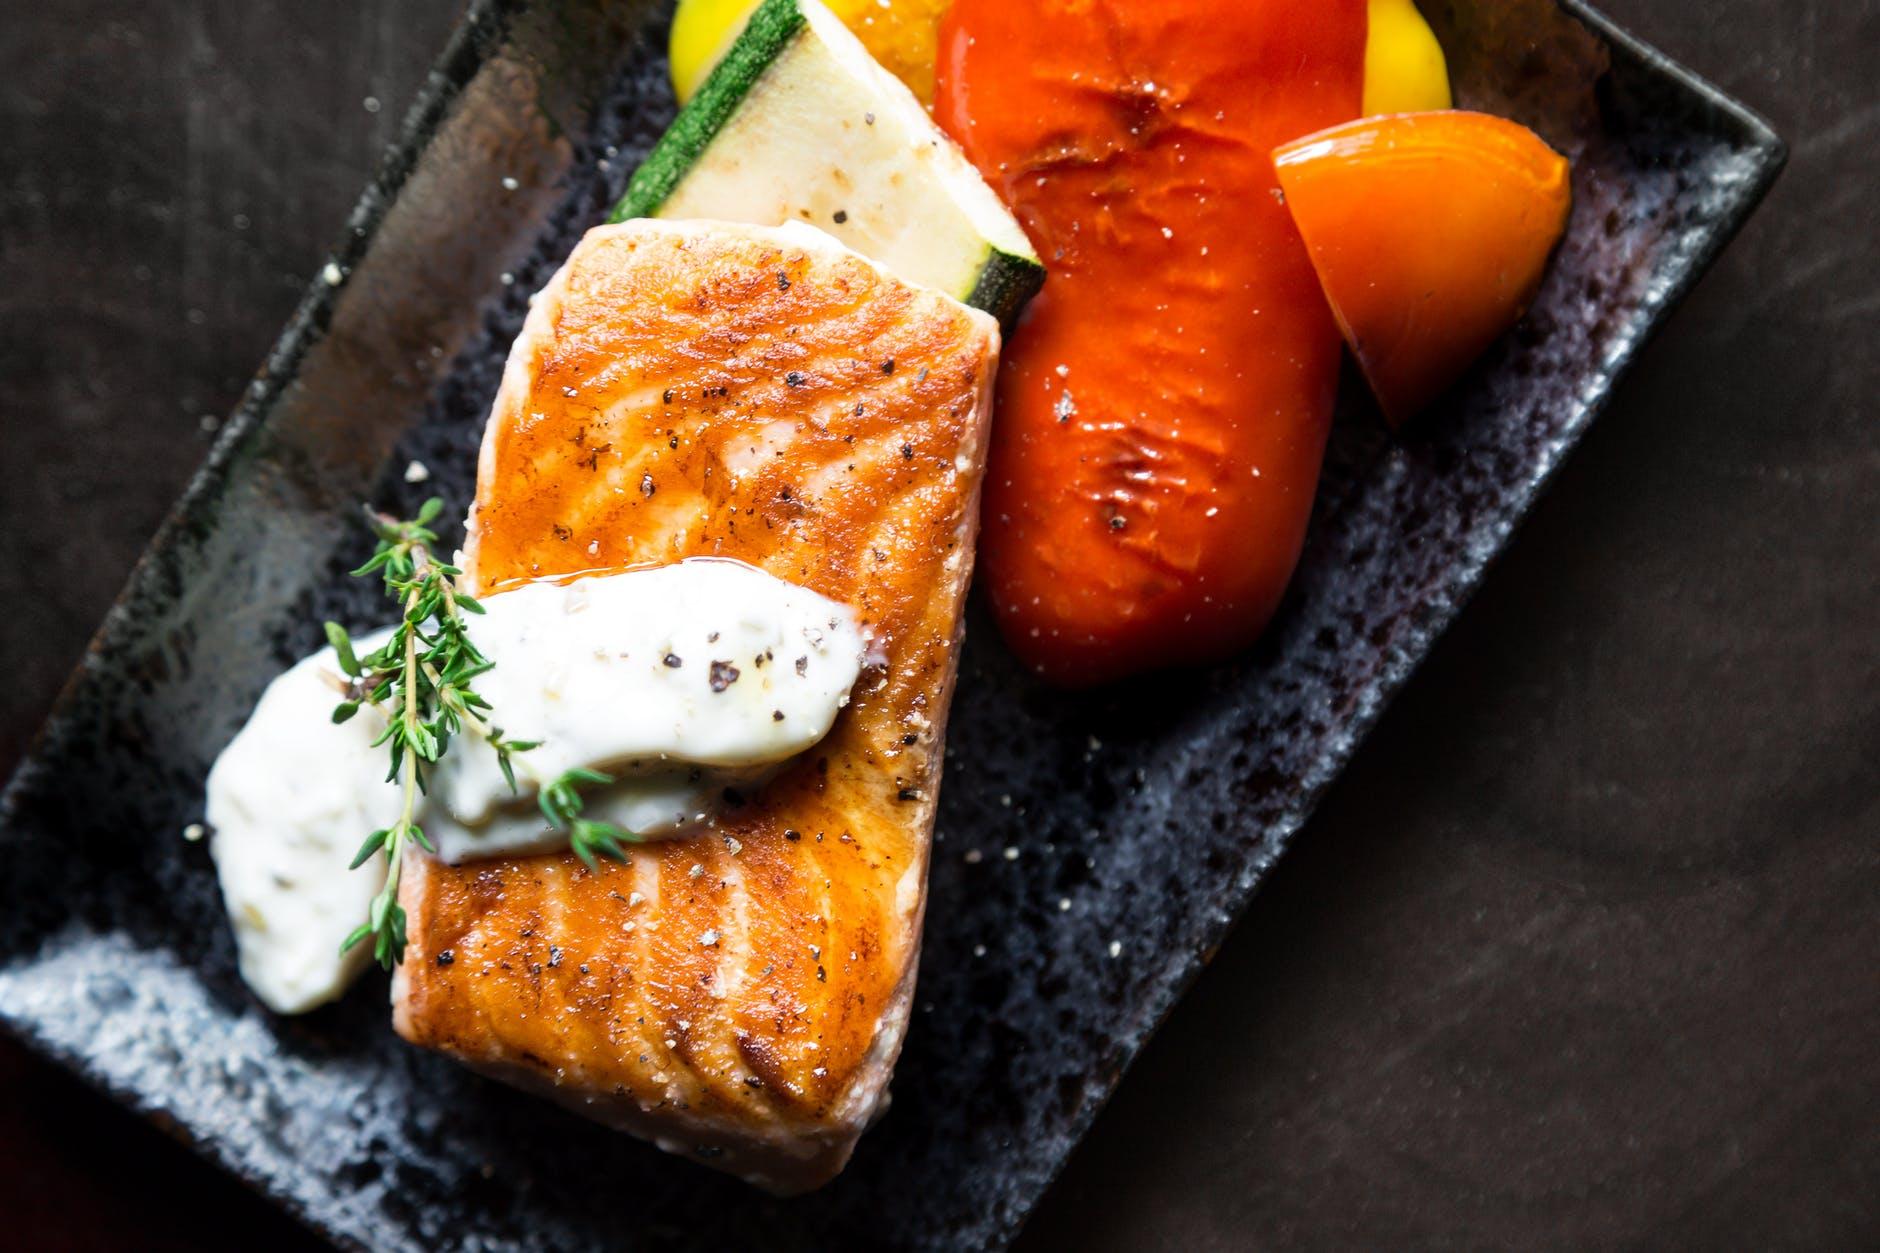 grilled salmon fish on rectangular black ceramic plate